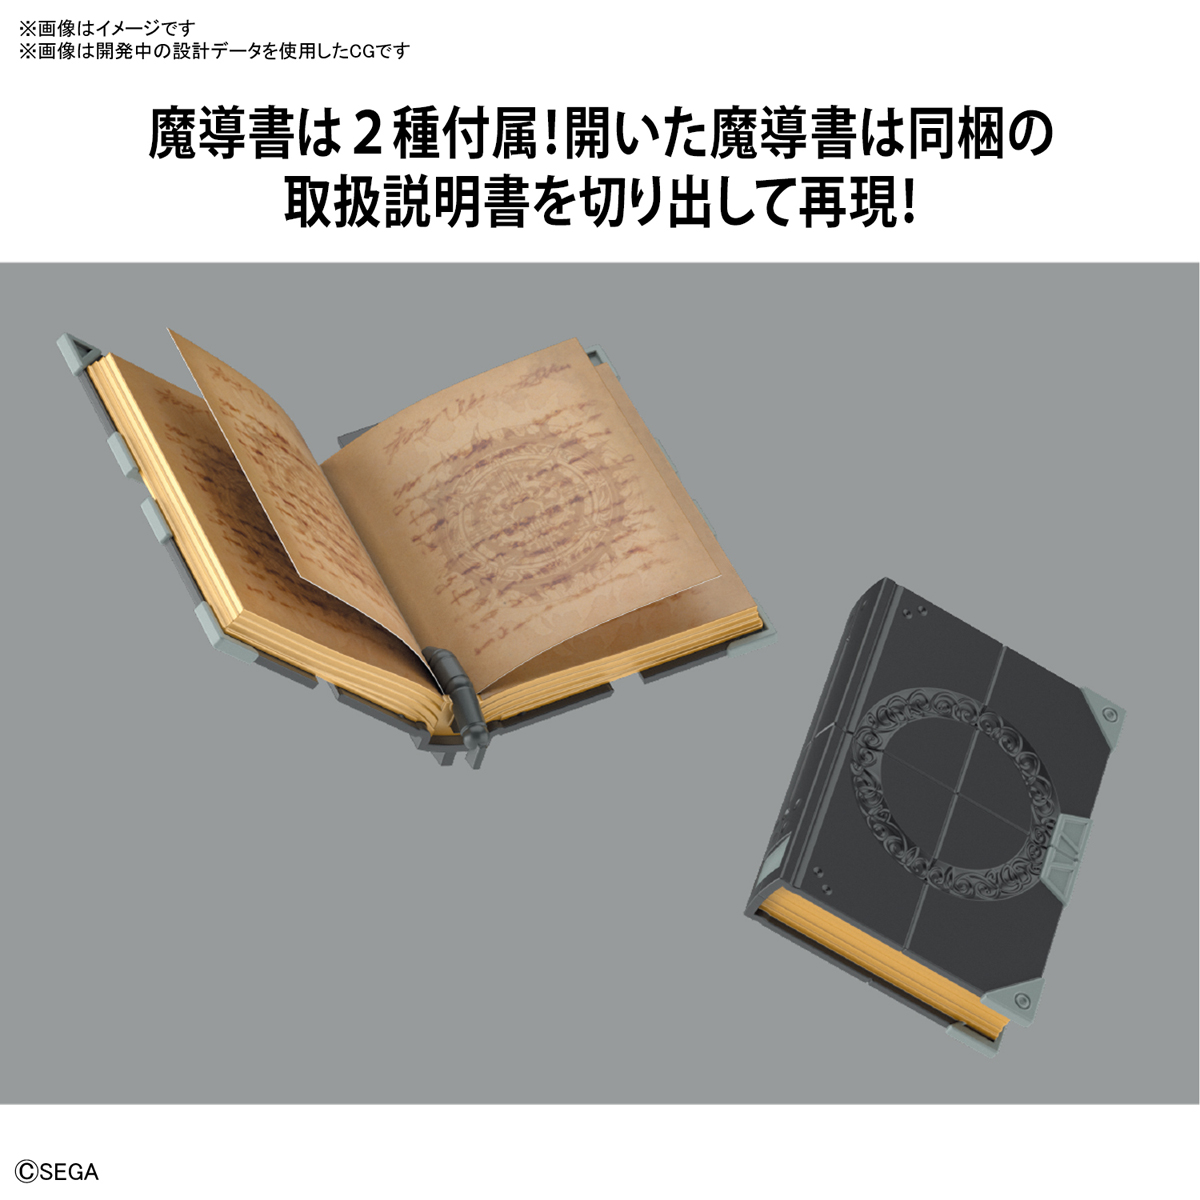 HG 1/24『霊子戦闘機・無限(クラリス機)』新サクラ大戦 プラモデル-005